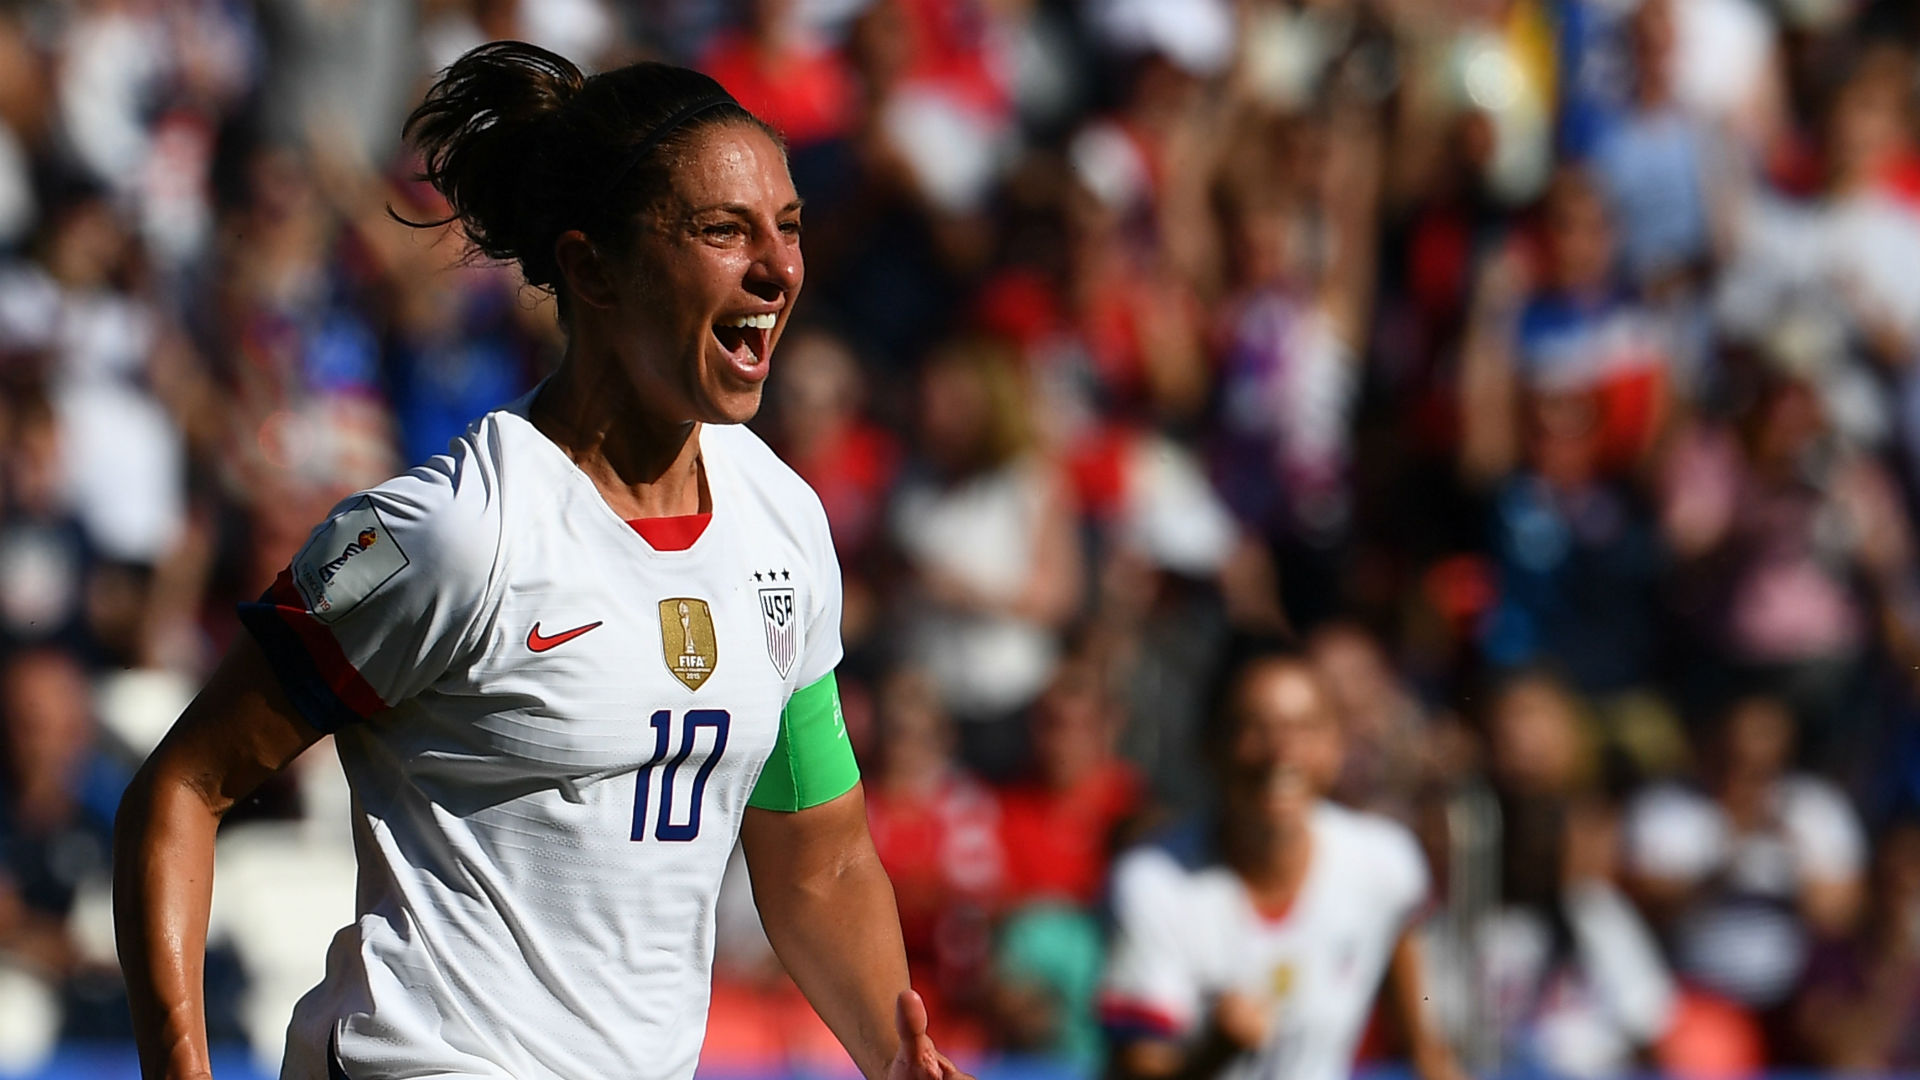 Women's World Cup 2019: U.S. coach Jill Ellis praises Carli Lloyd after two-goal performance